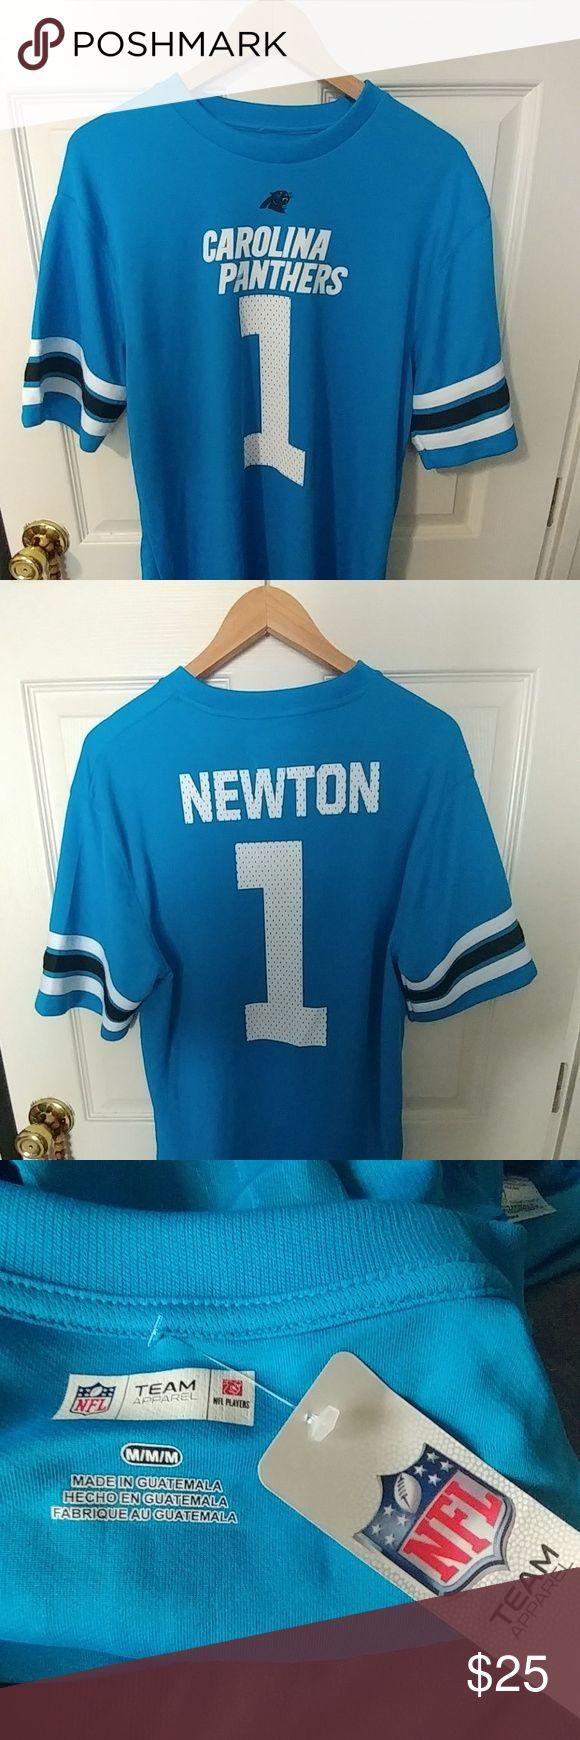 Cam Newton Carolina Panthers Shirt Jerseys NFL Jersey mesh t shirt Jersey, New with tags o.b.o. Nike Shirts Tees - Short Sleeve